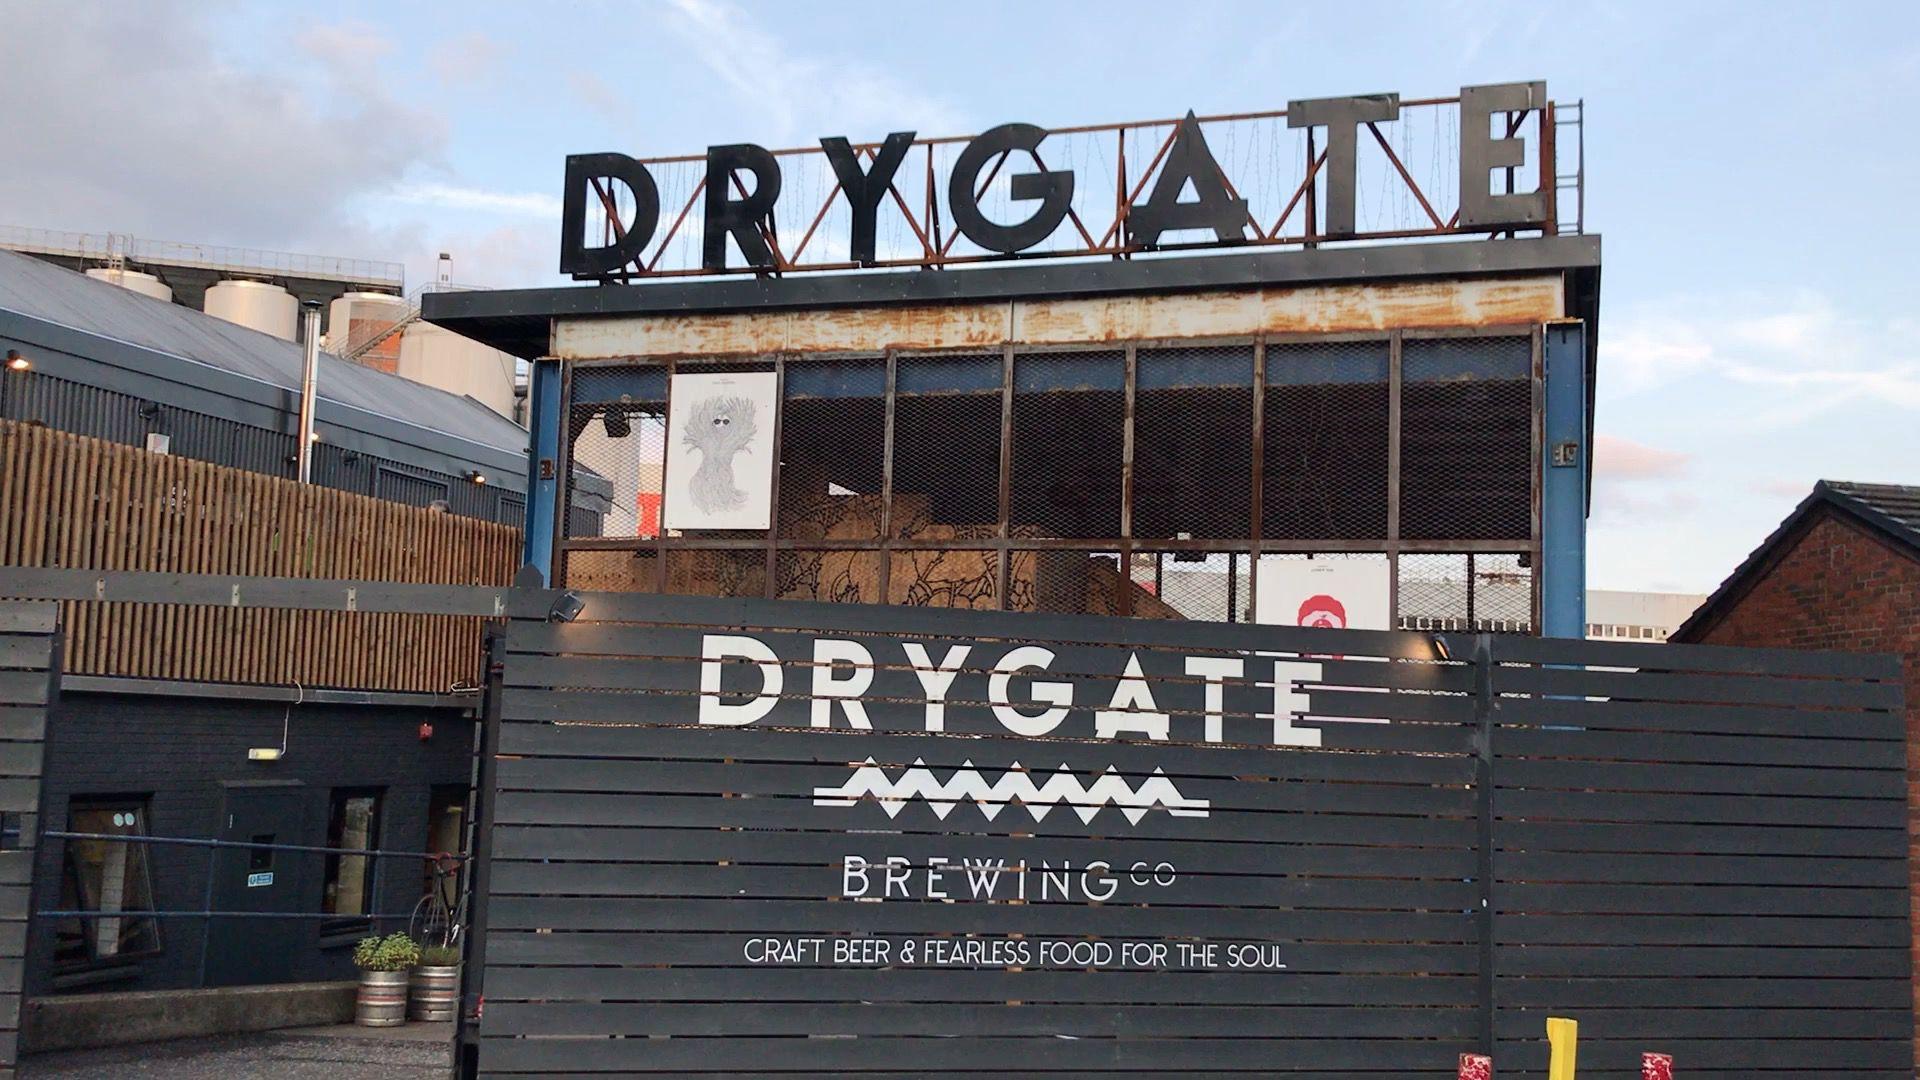 Glasgow - Drygate Brewing Co.